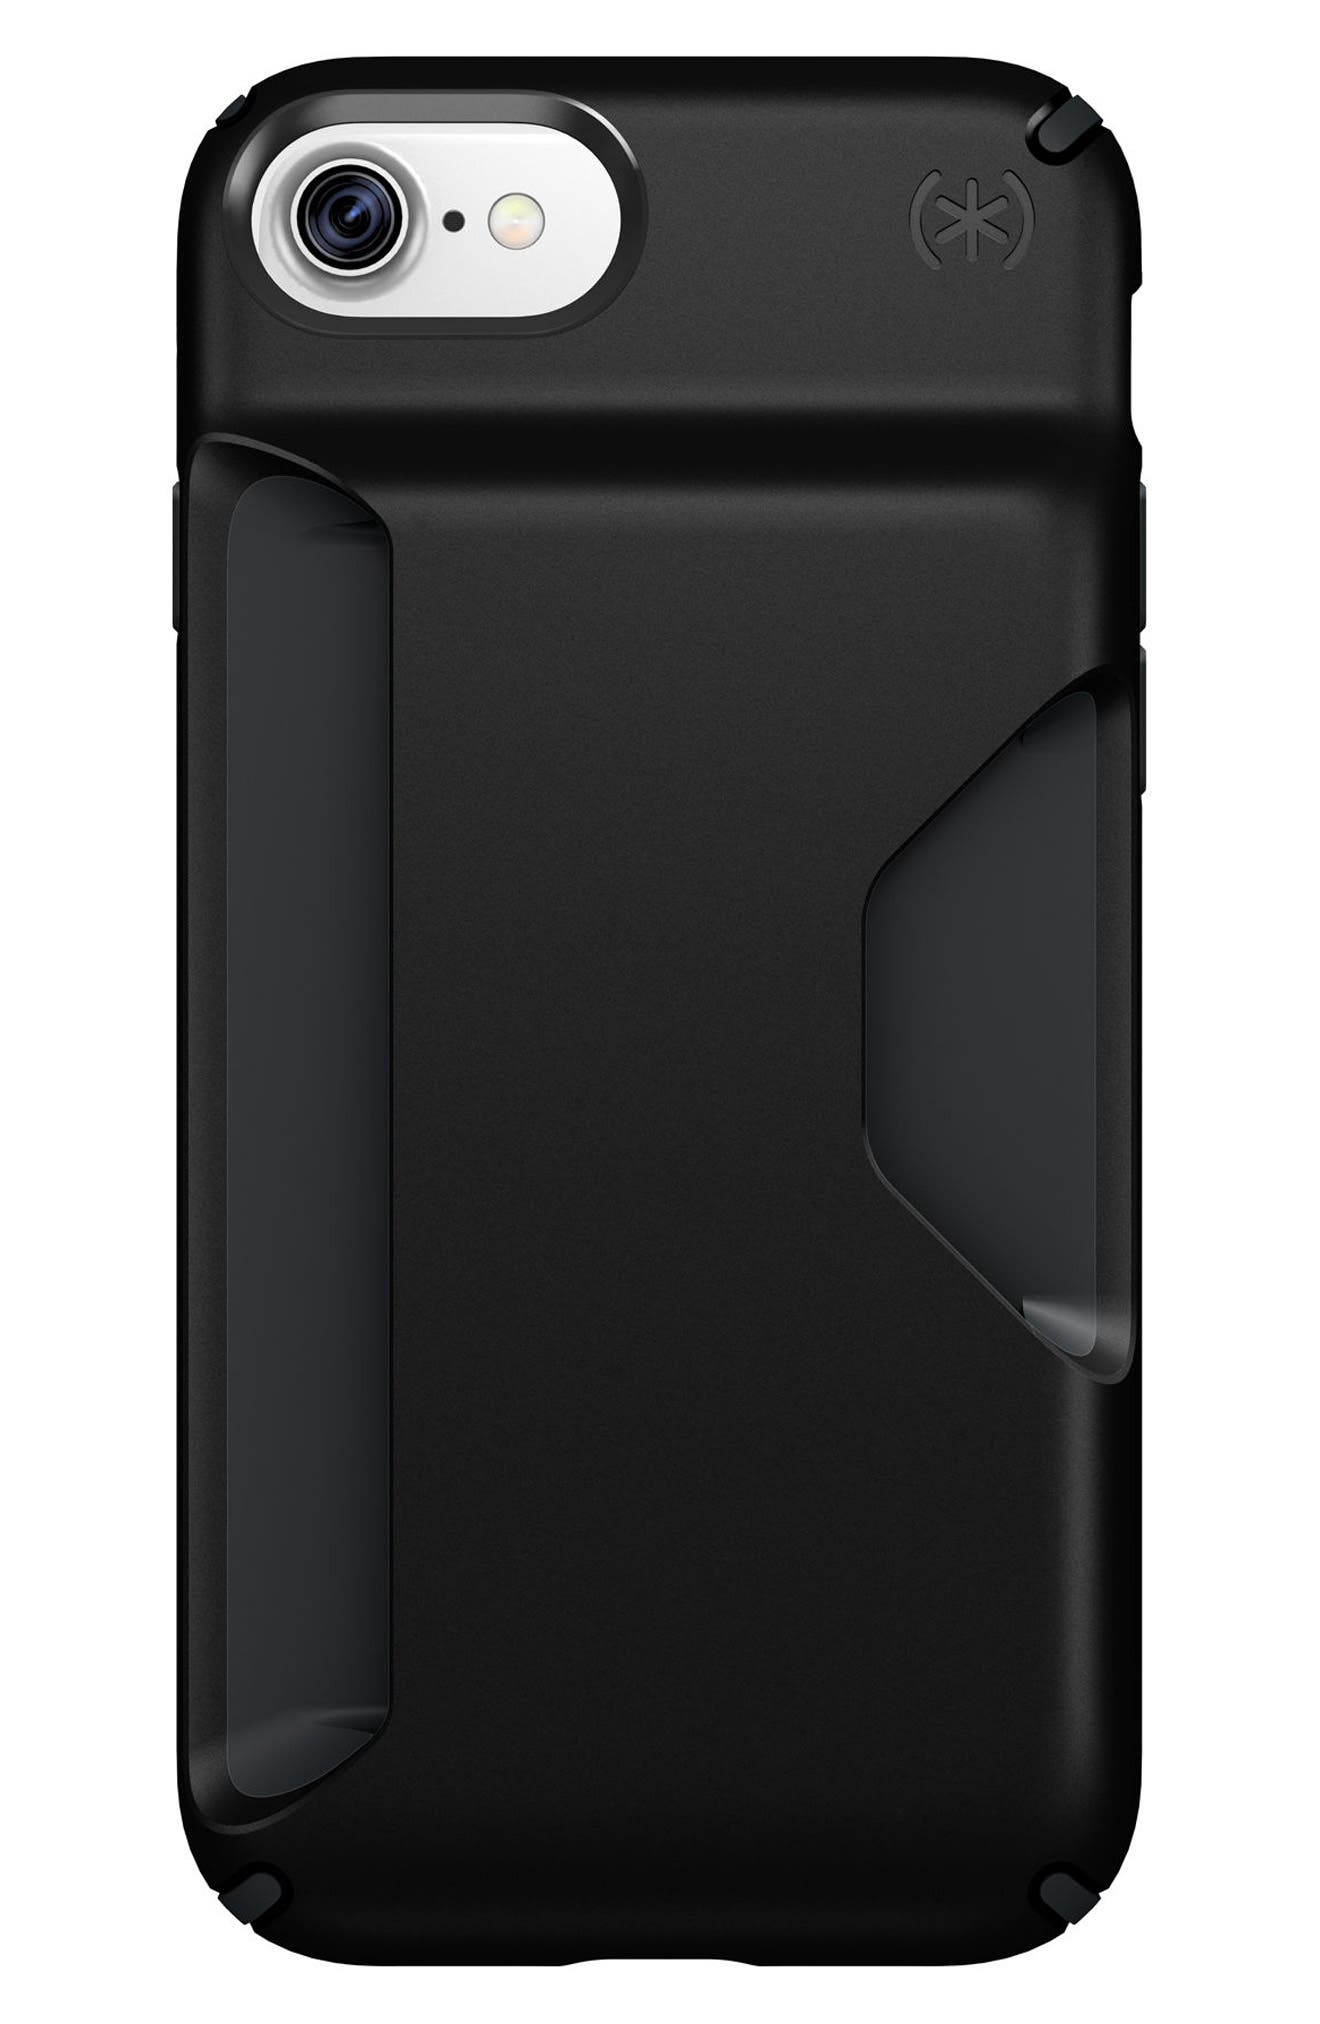 Speck Presidio Wallet iPhone 6/6s/7/8 Case